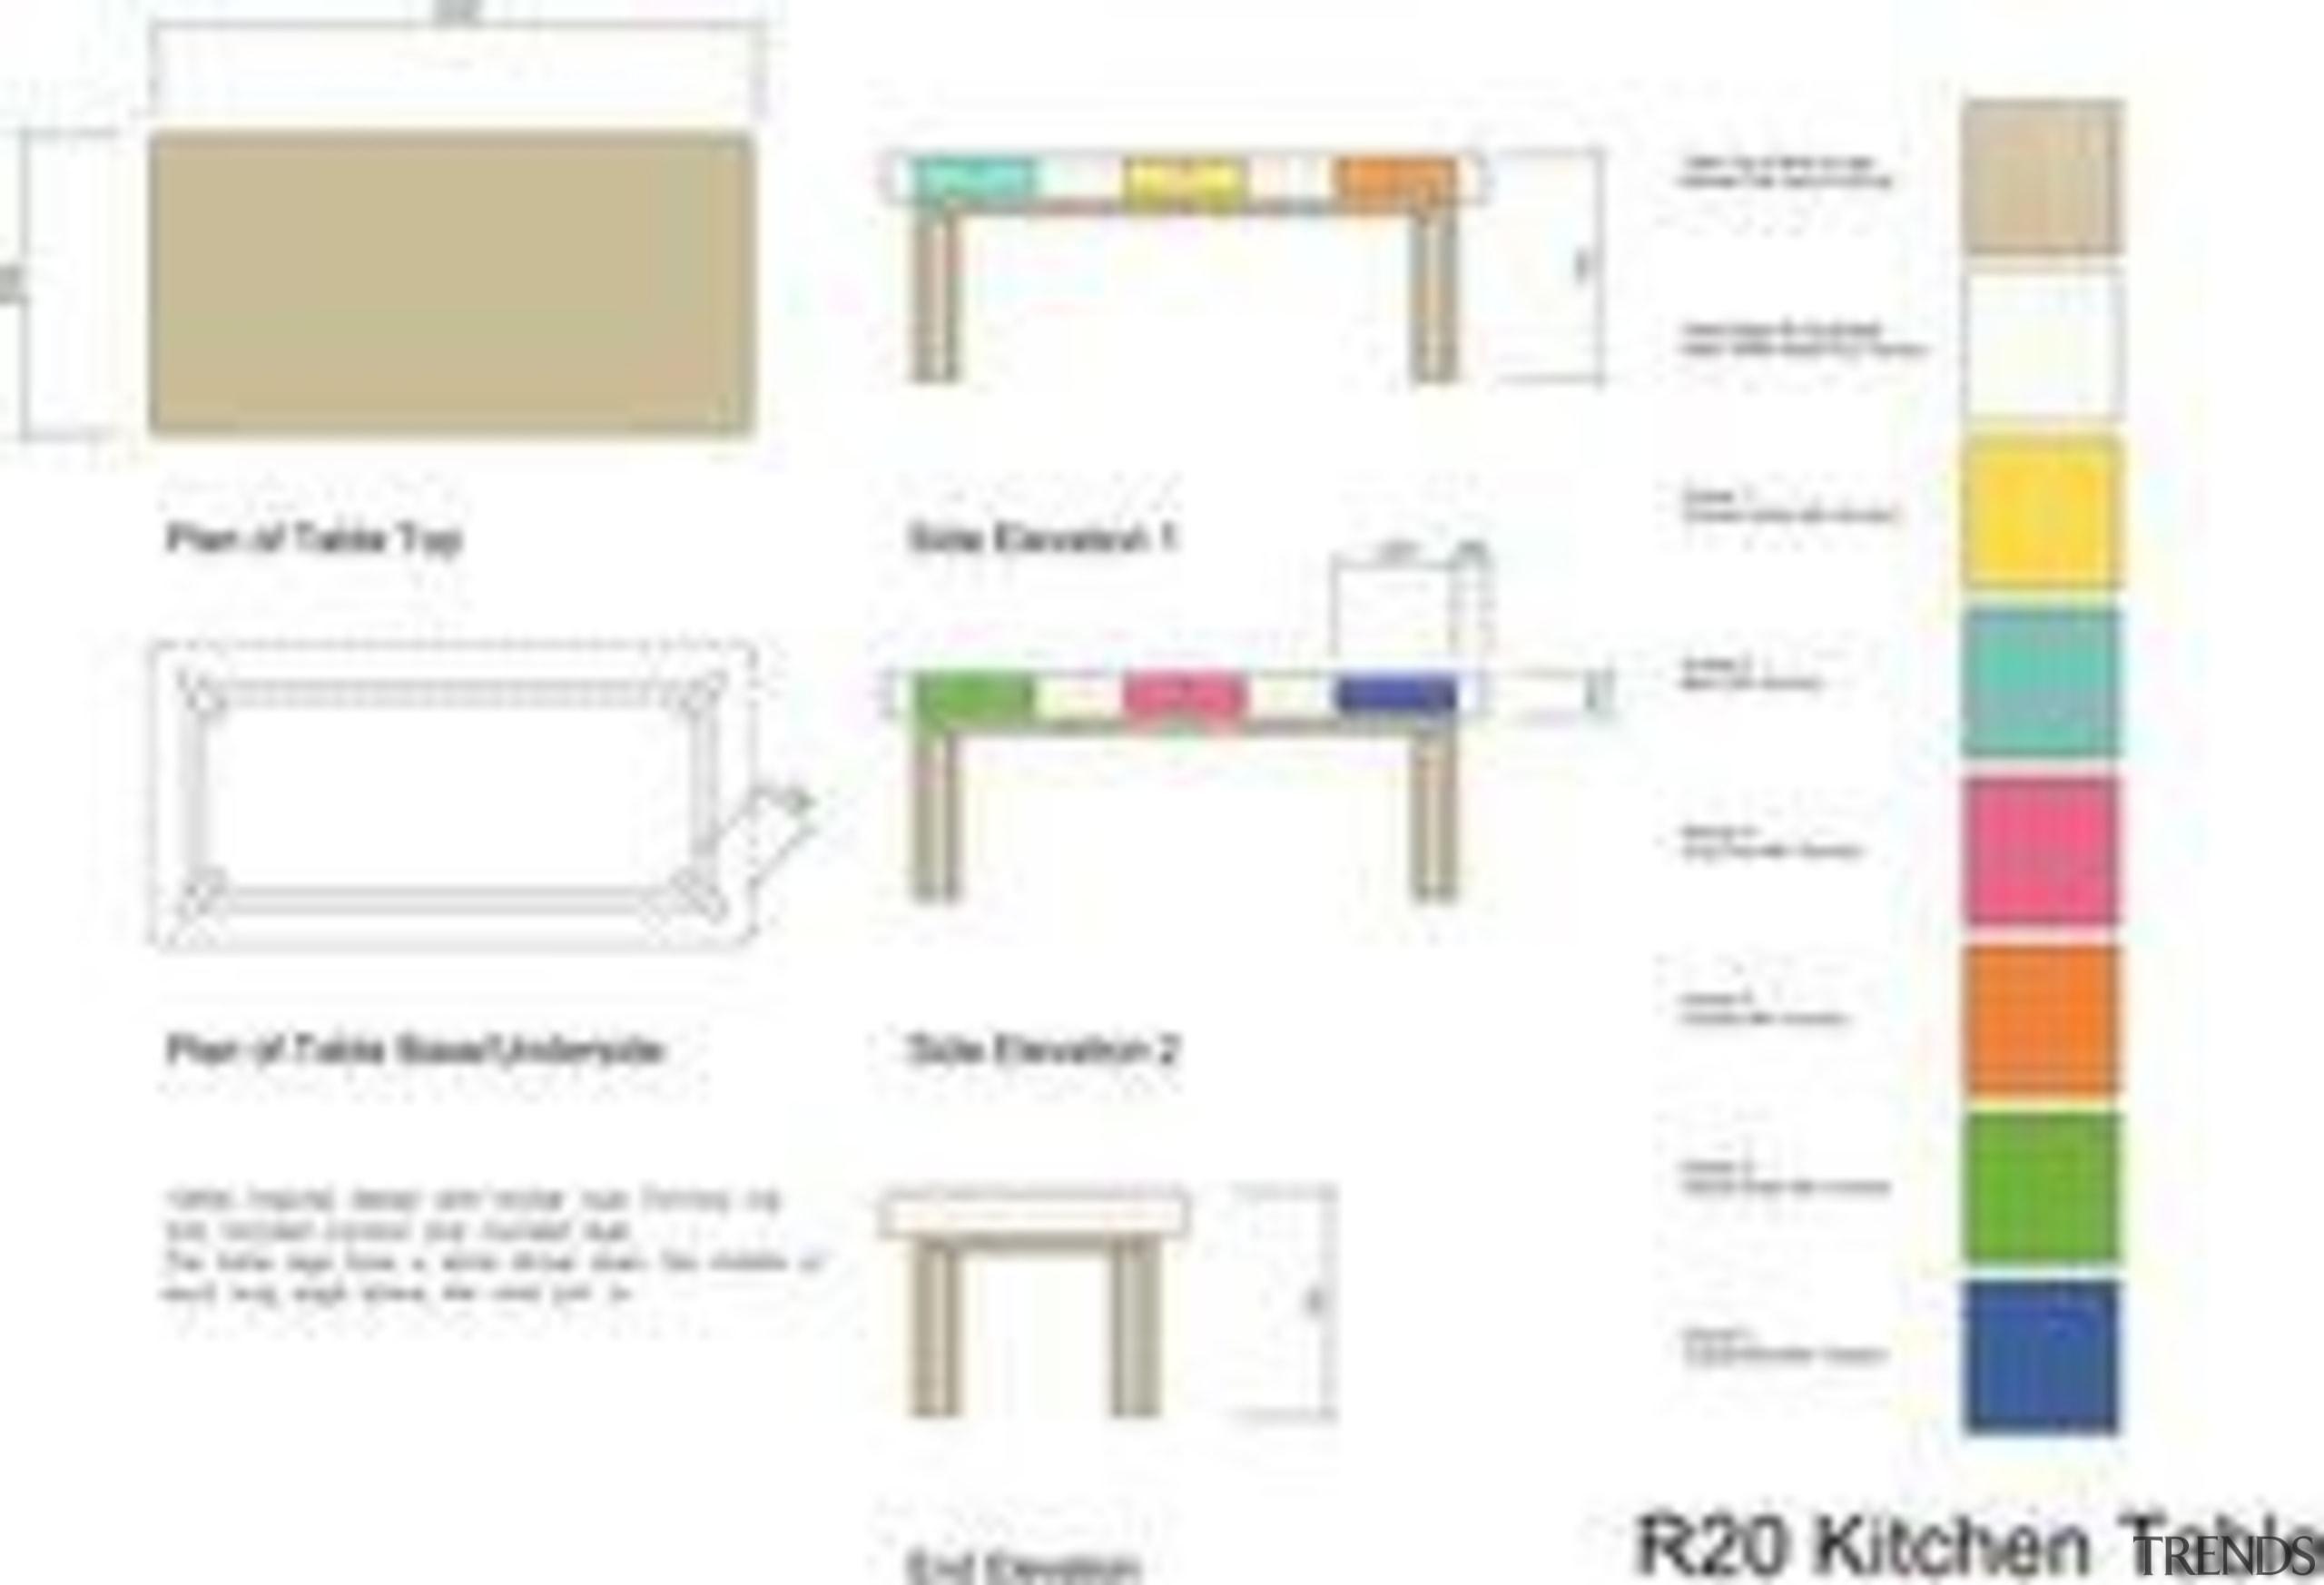 fa84791f91c97f8e25e48a31662a5cc0.jpg - fa84791f91c97f8e25e48a31662a5cc0.jpg - area | design | area, design, diagram, line, product, product design, text, white